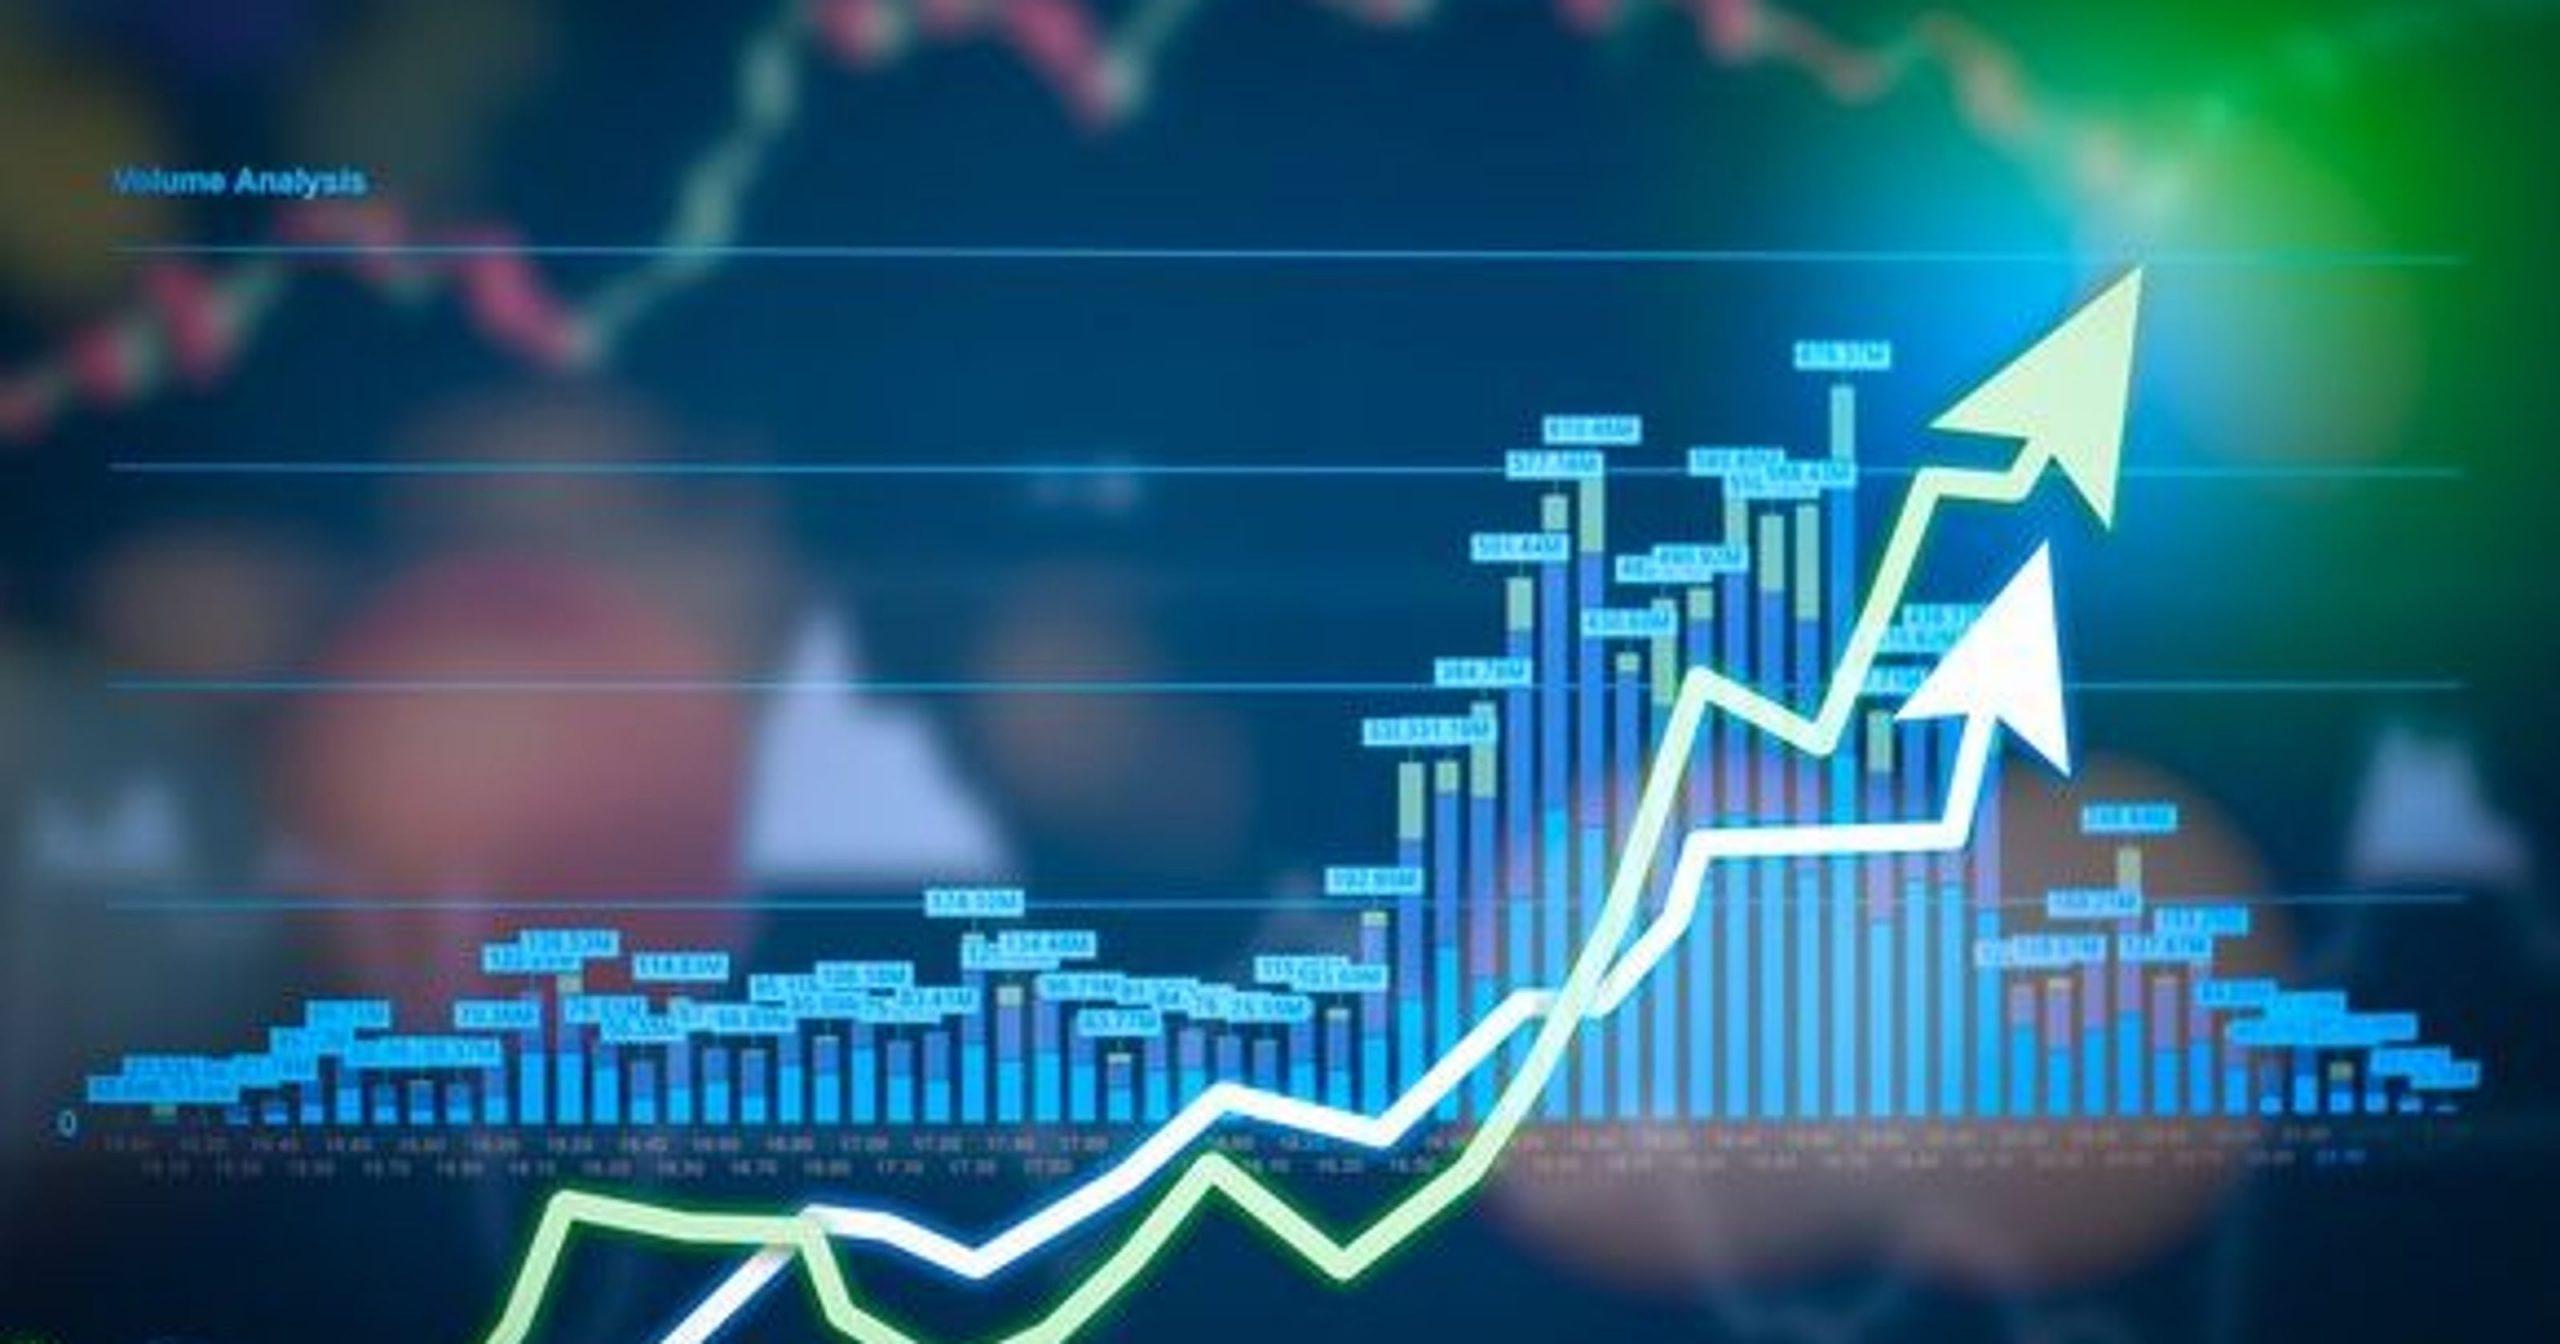 getty stock market rising large scaled - مروری بر اخبار بازار جهان؛ سهام آسیا رشد کرد